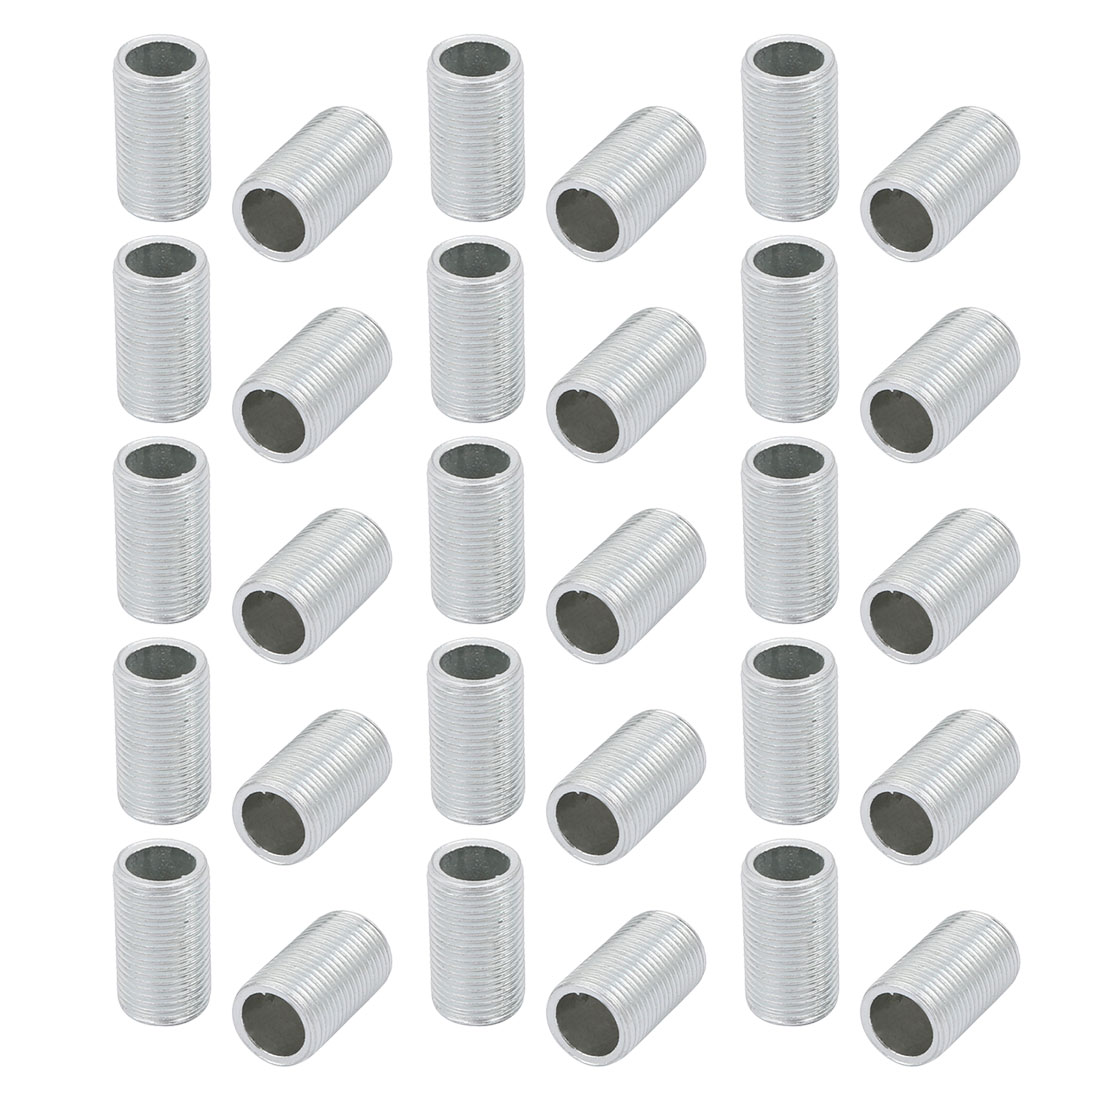 30 Pcs Metric M12 1mm Pitch Thread Zinc Plated Pipe Nipple Lamp Parts 20mm Long